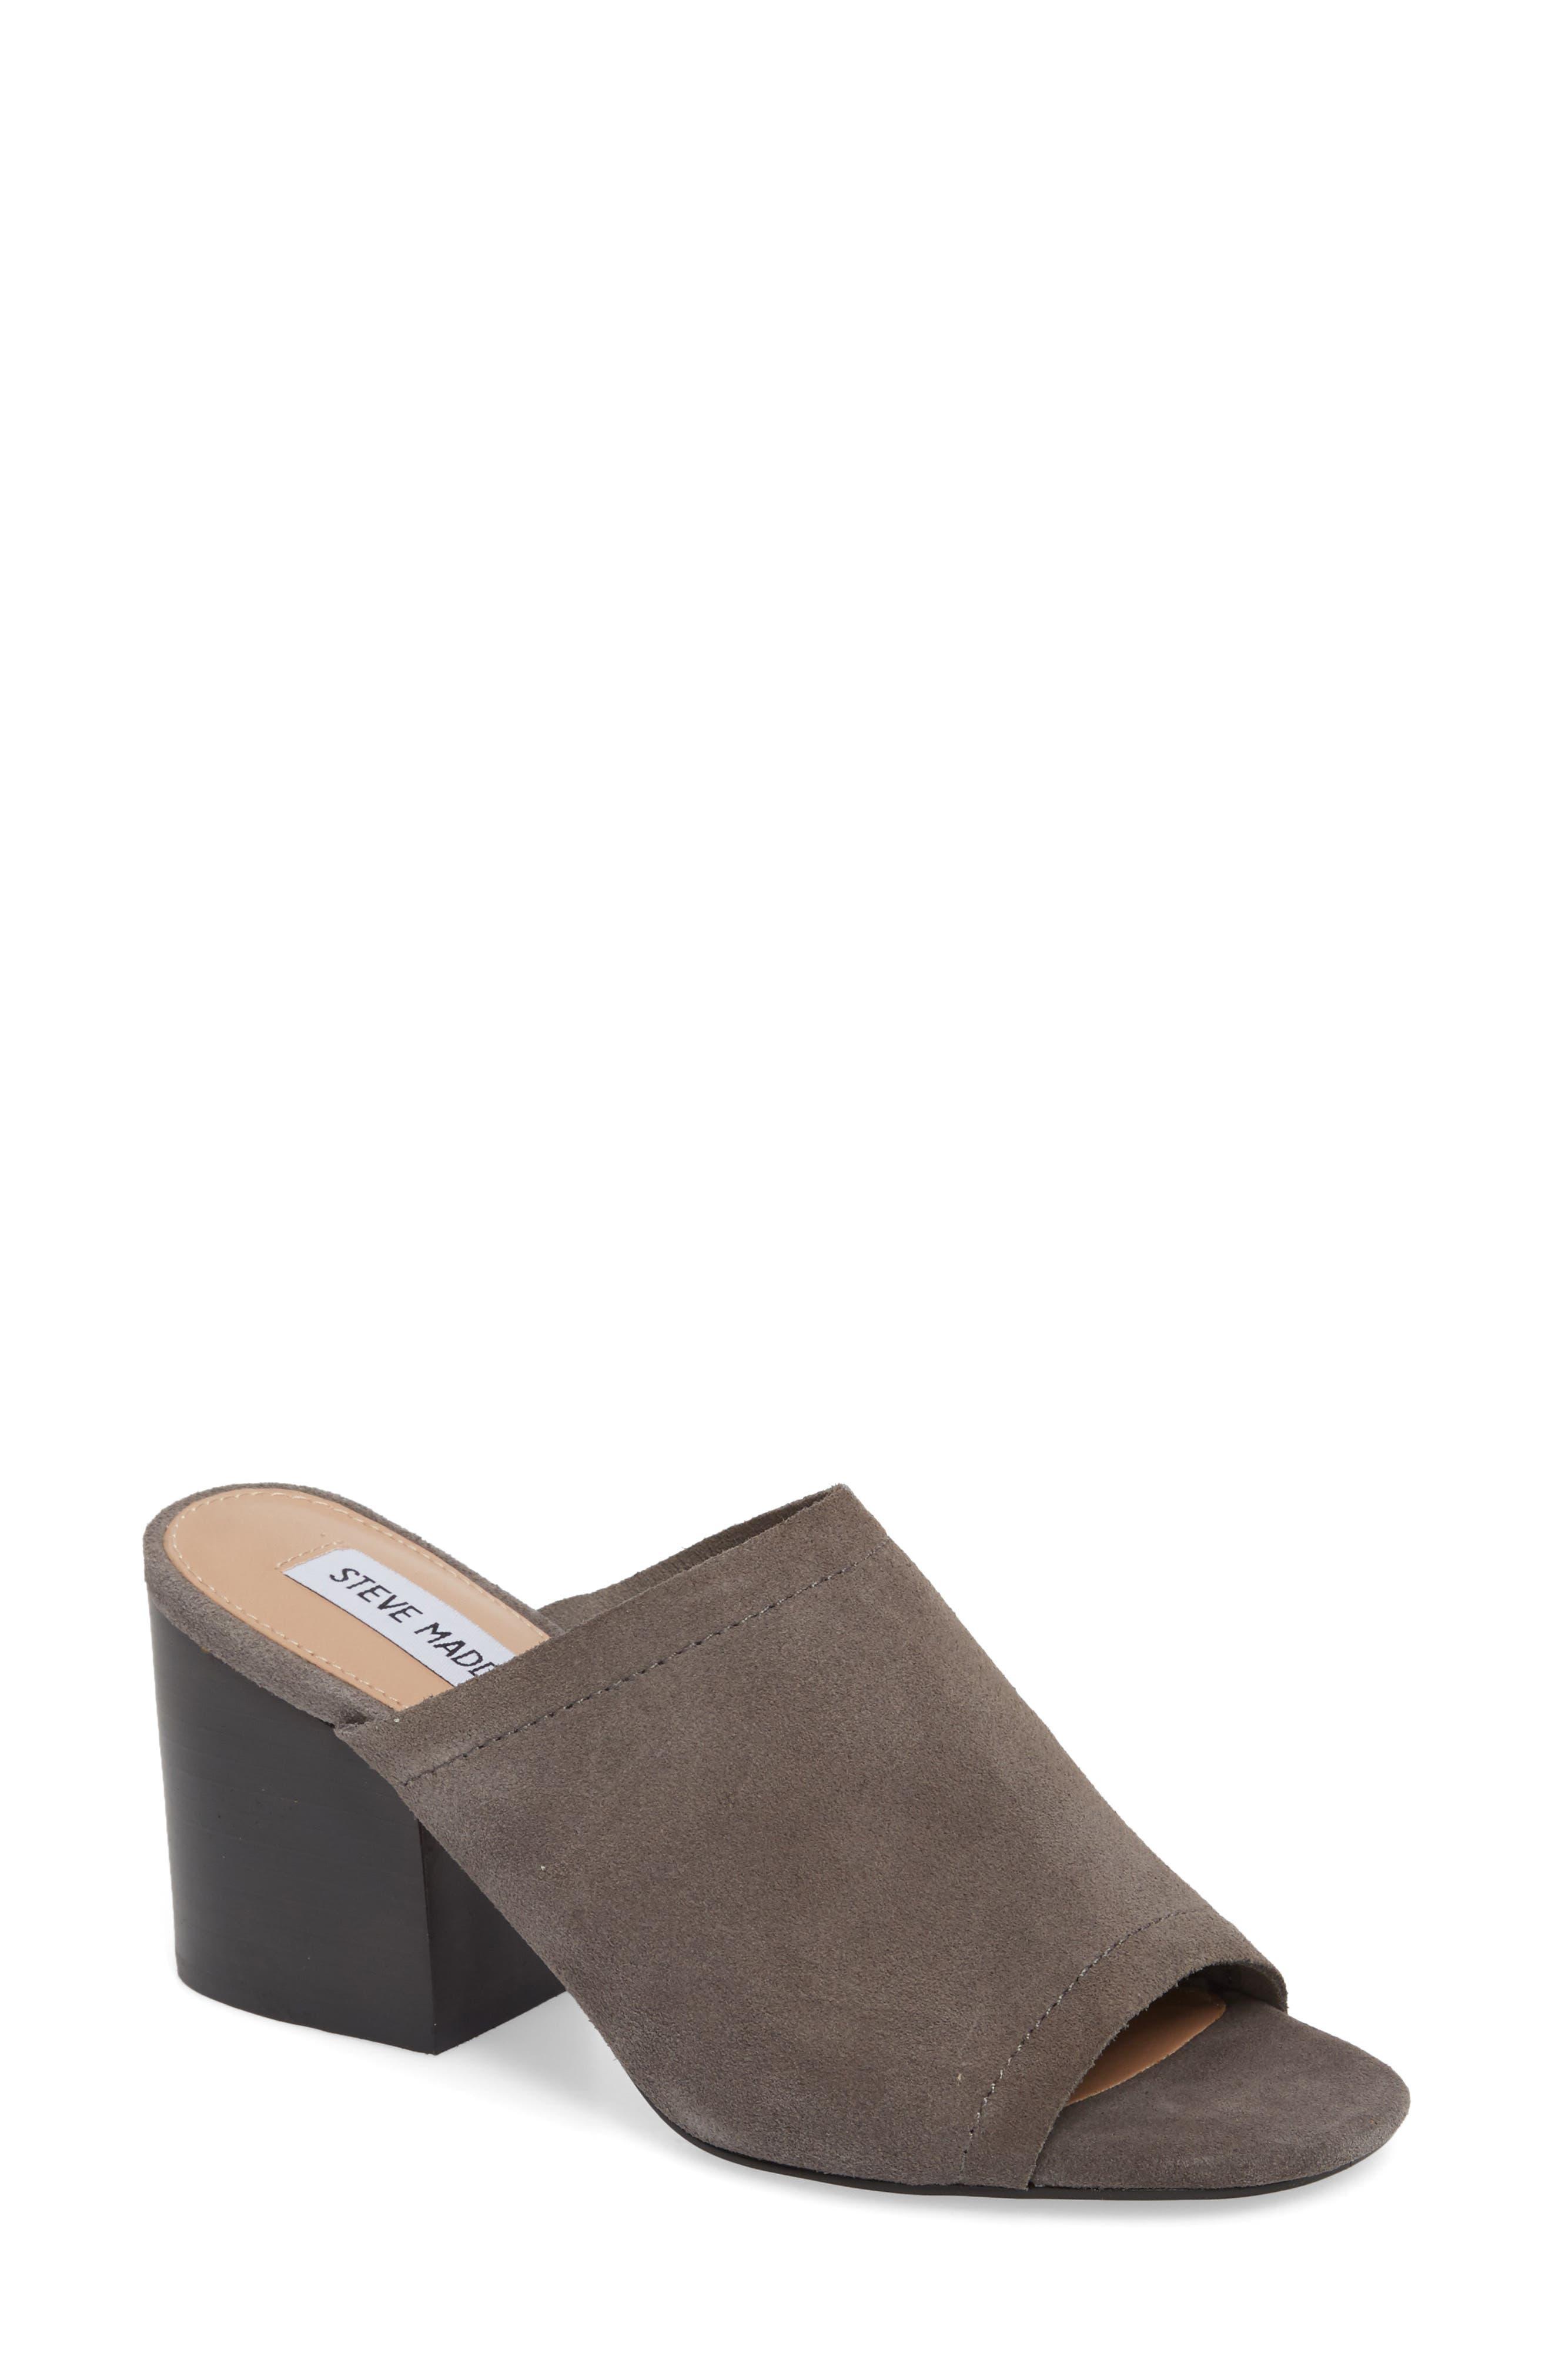 Doran Mule Sandal,                         Main,                         color, GREY SUEDE